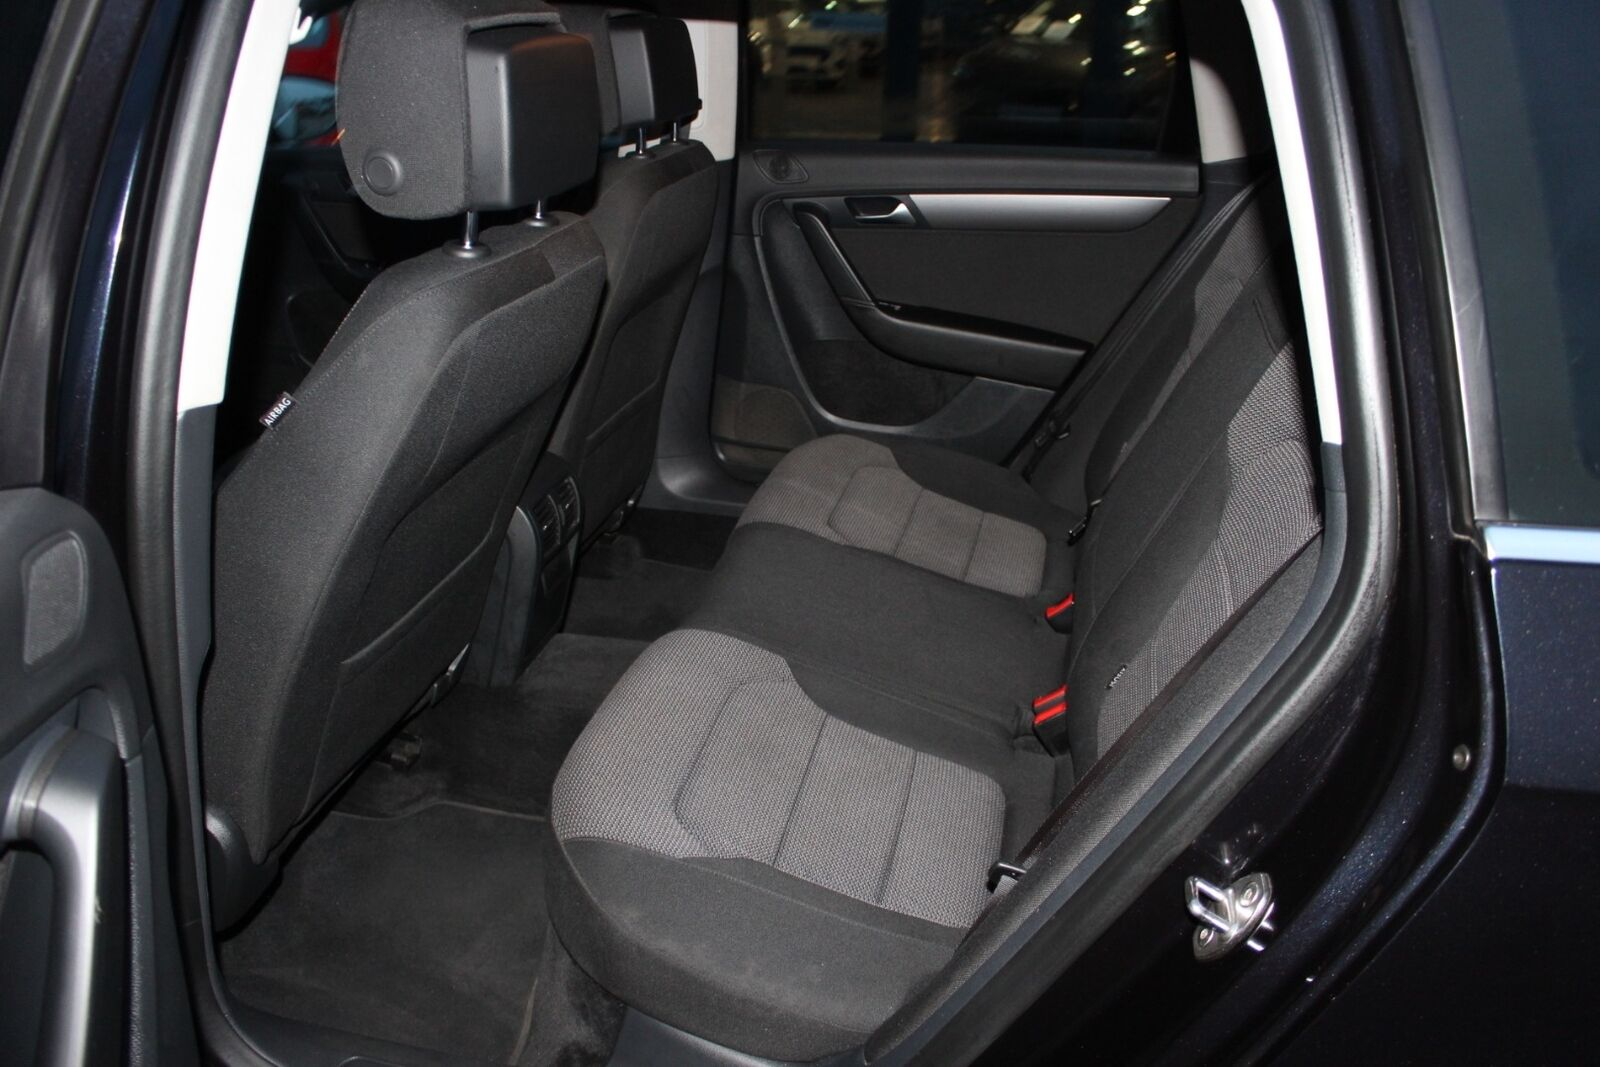 VW Passat 2,0 TDi 140 Comfortl. Vari. BMT - billede 7